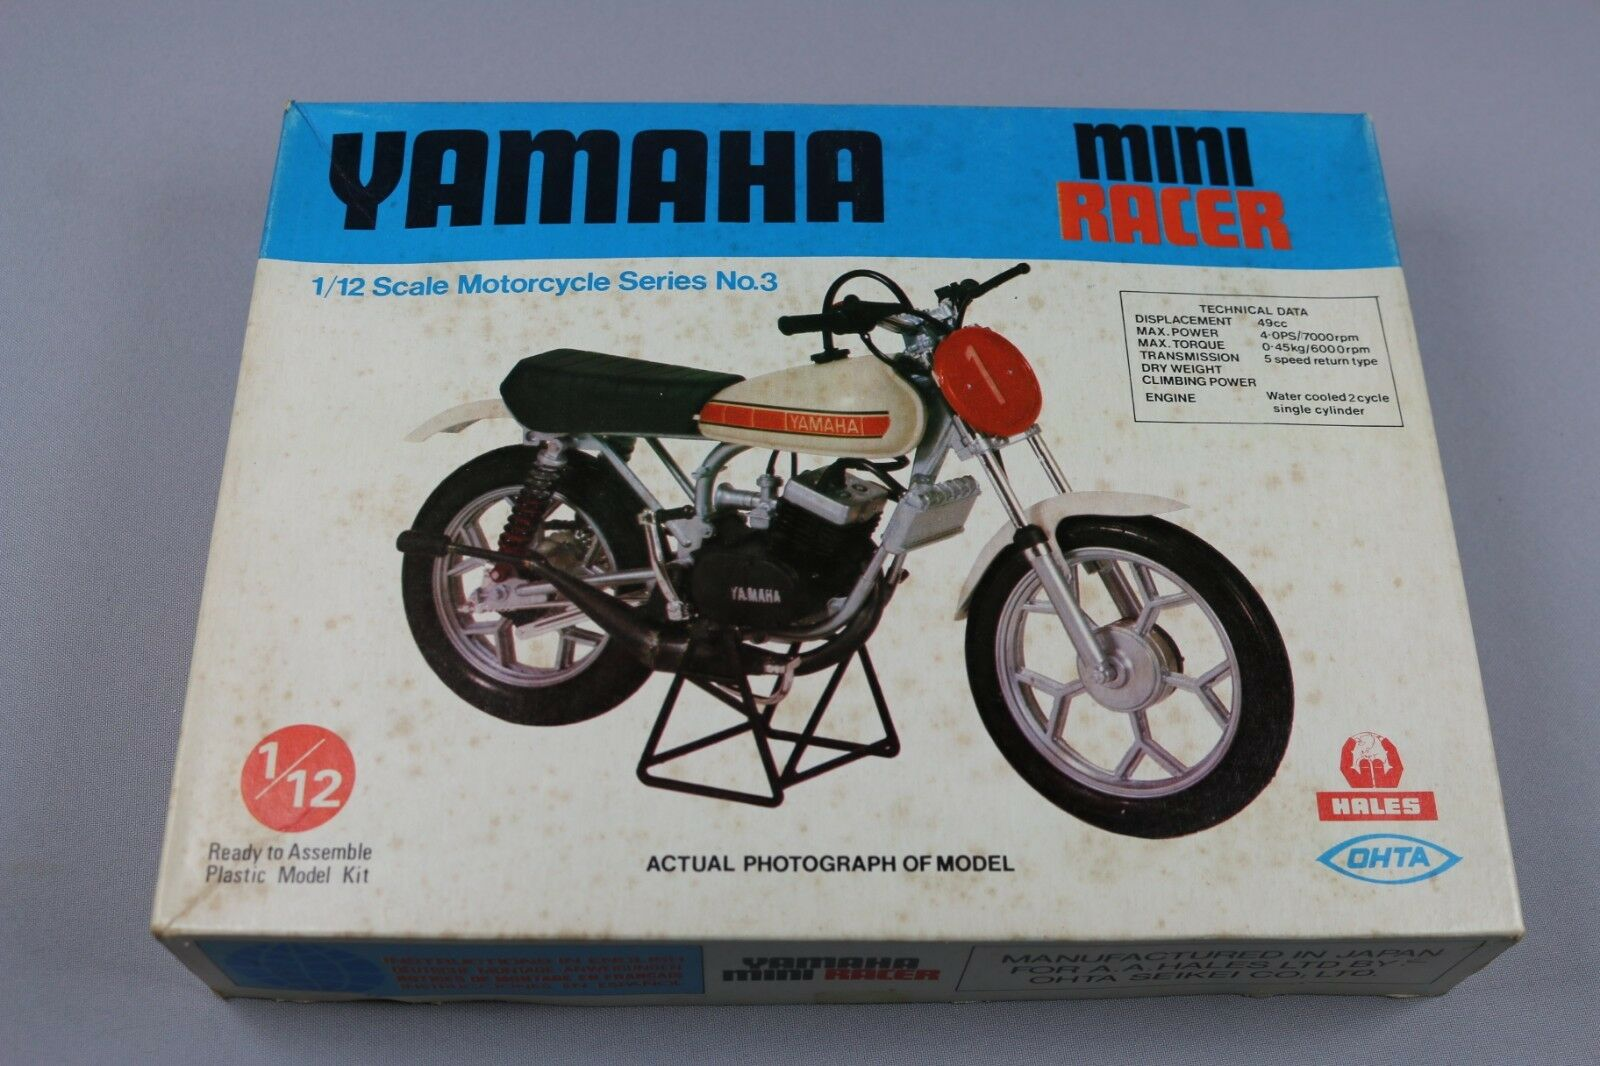 Zf1028 Hales Ohta 1 12 Maqueta Moto M12013 Yamaha Mini Racer 2 Strokes Serie 3